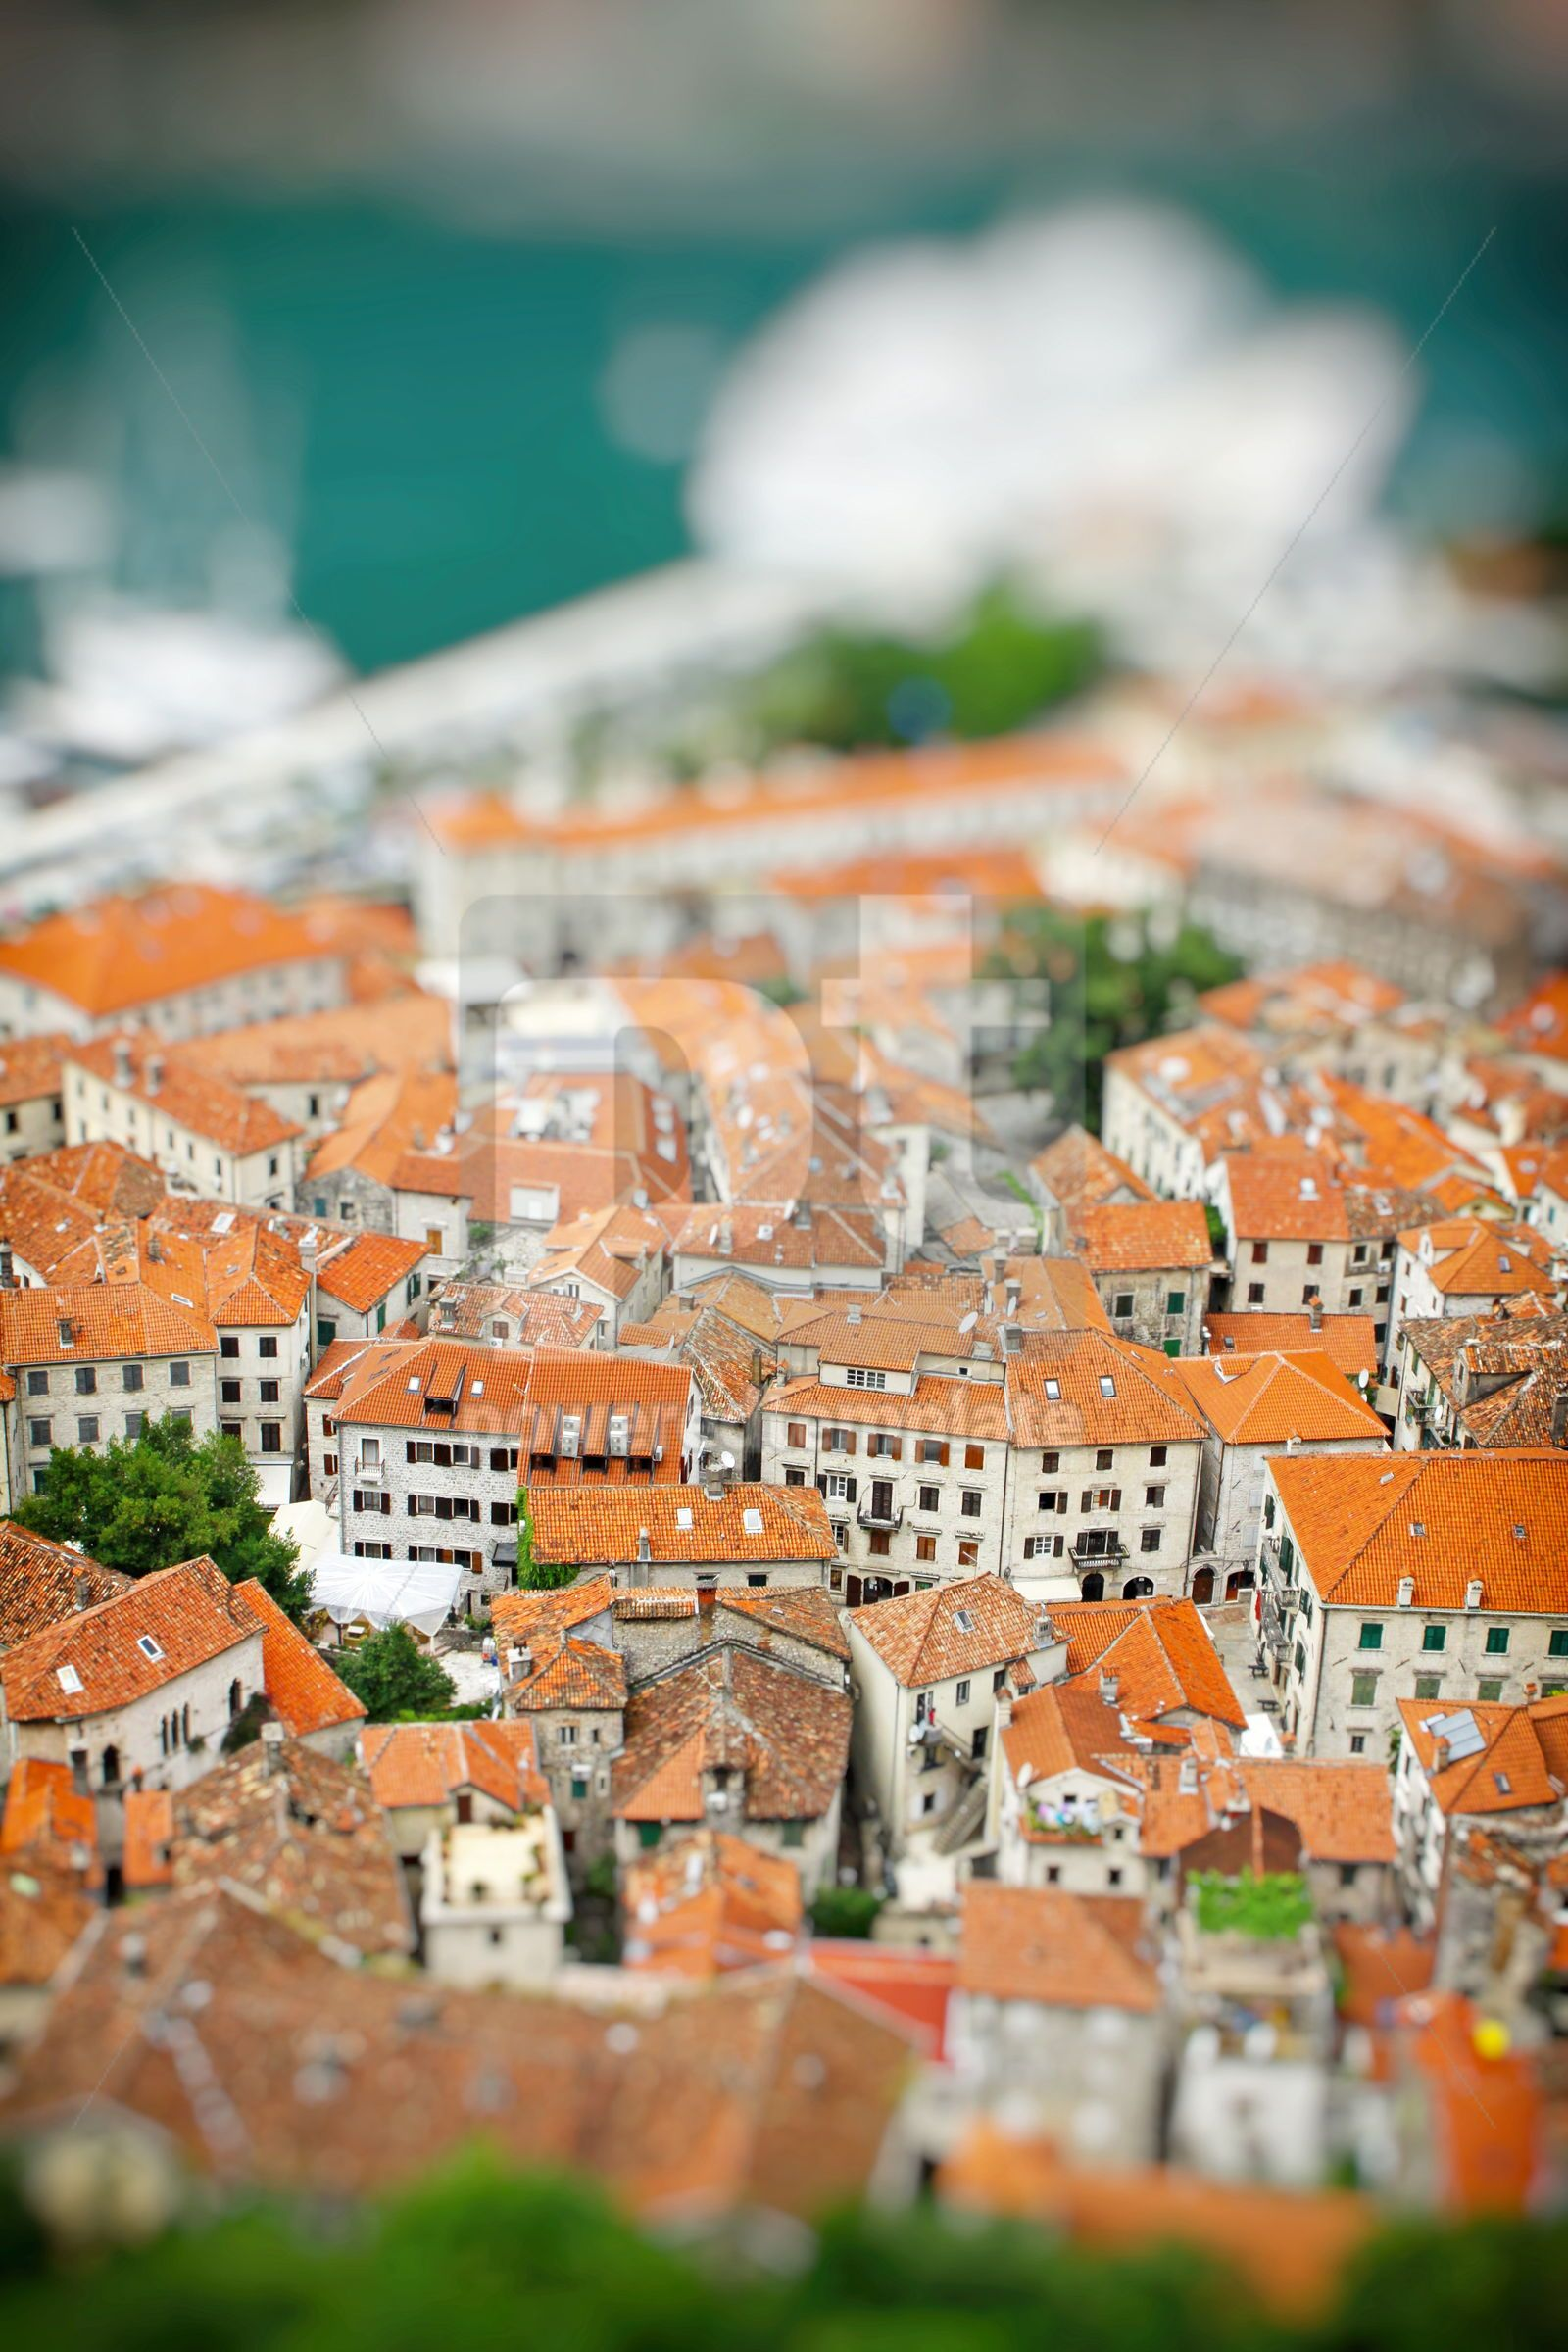 Kotor old town Montenegro Tilt-shift Miniature Effect, 16461, Architecture  — PoweredTemplate.com